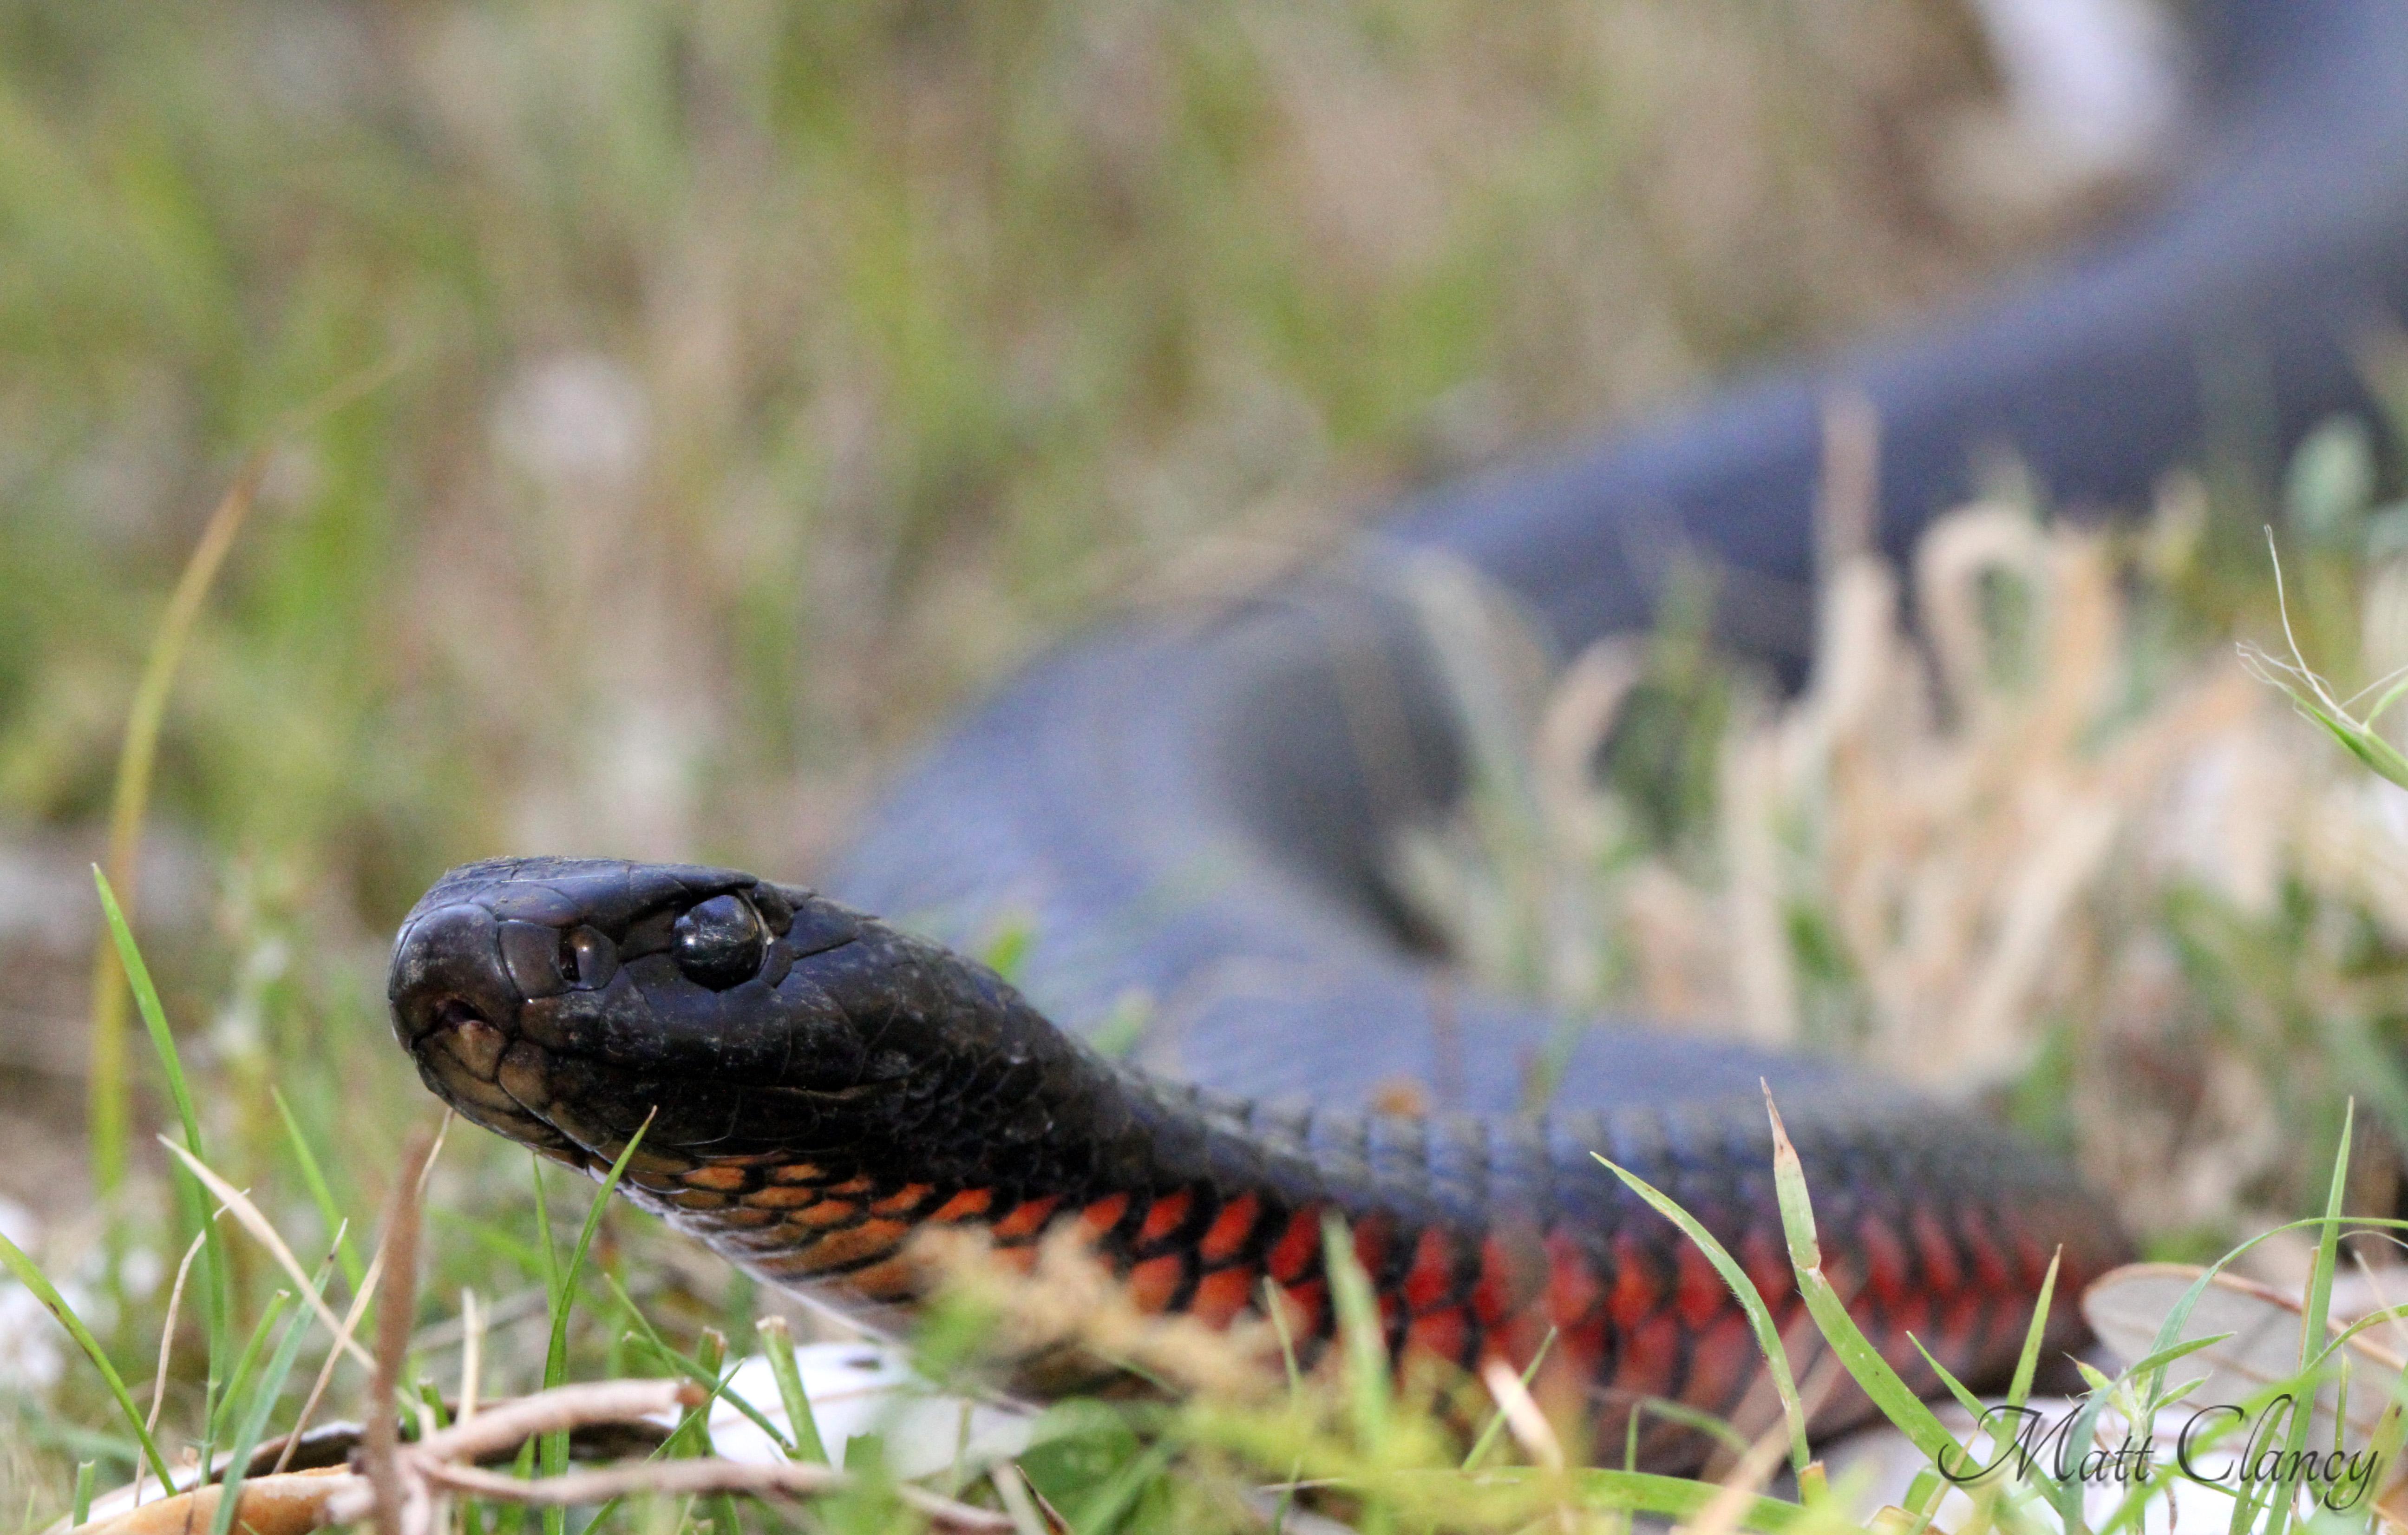 Red-bellied Black Snake svg #7, Download drawings